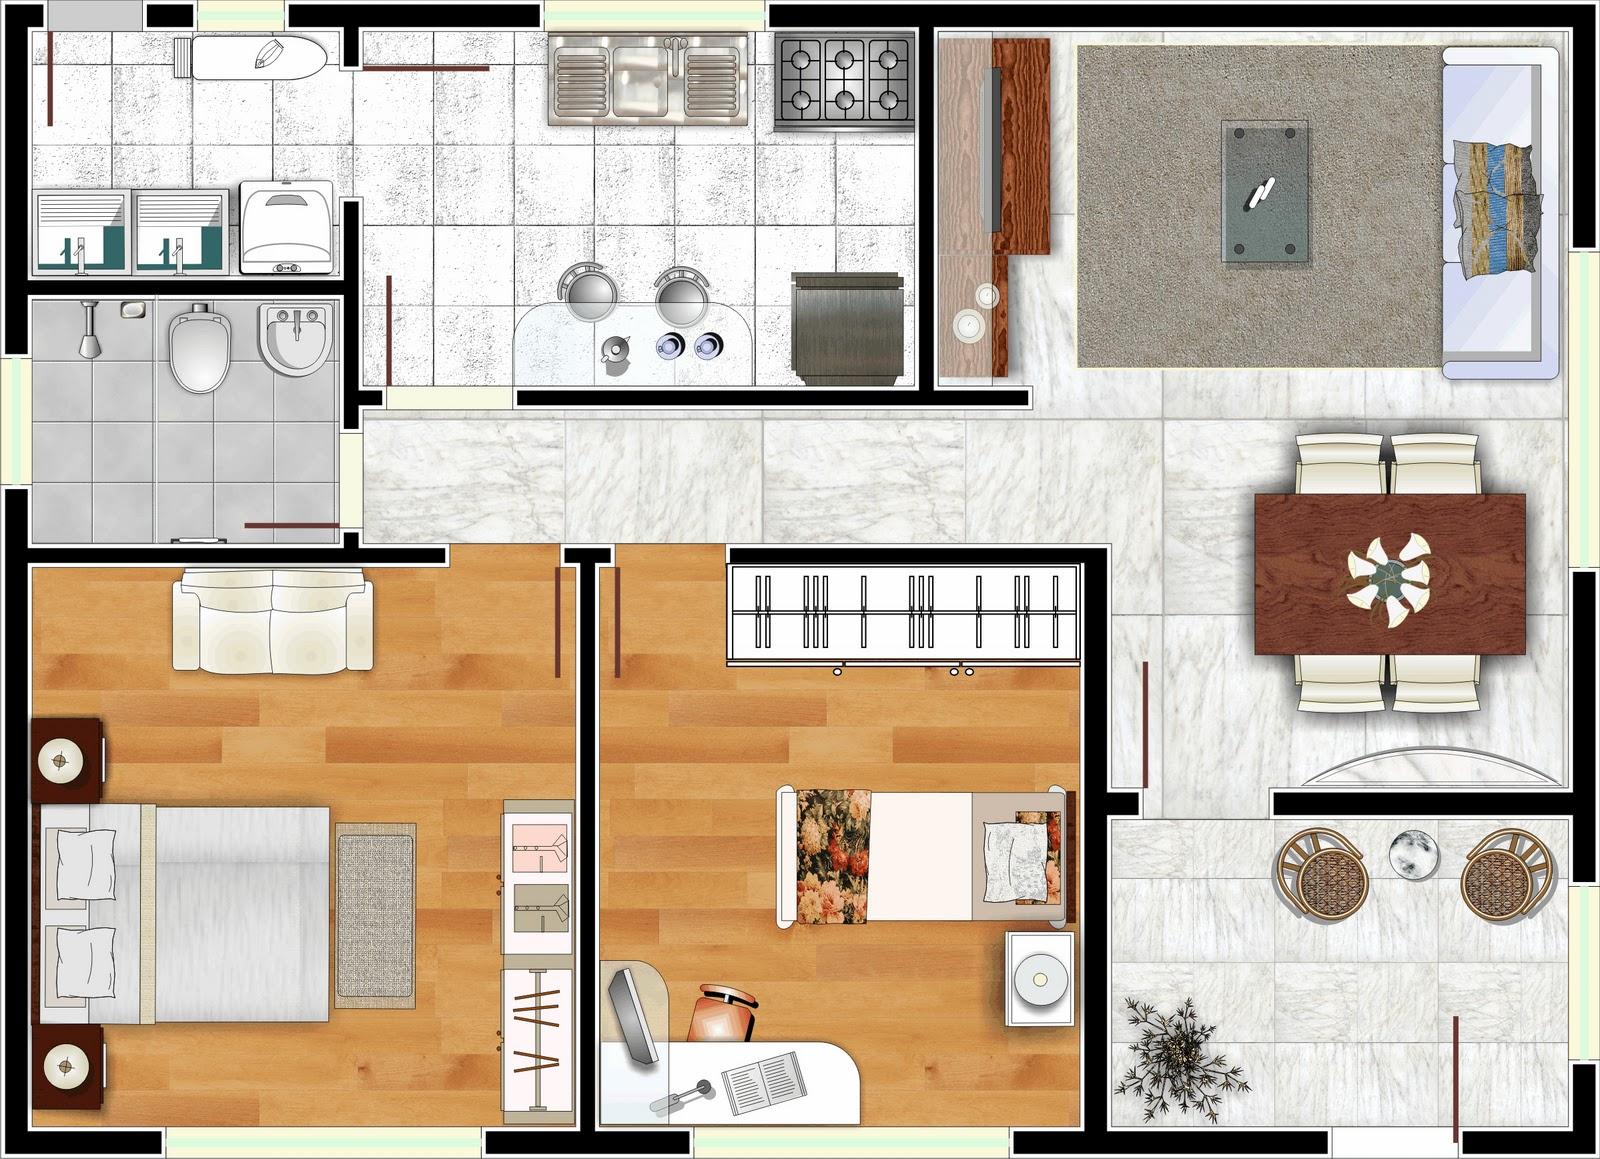 Planta Baixa De Casas Pequenas Modernas Modelos Incr Veis